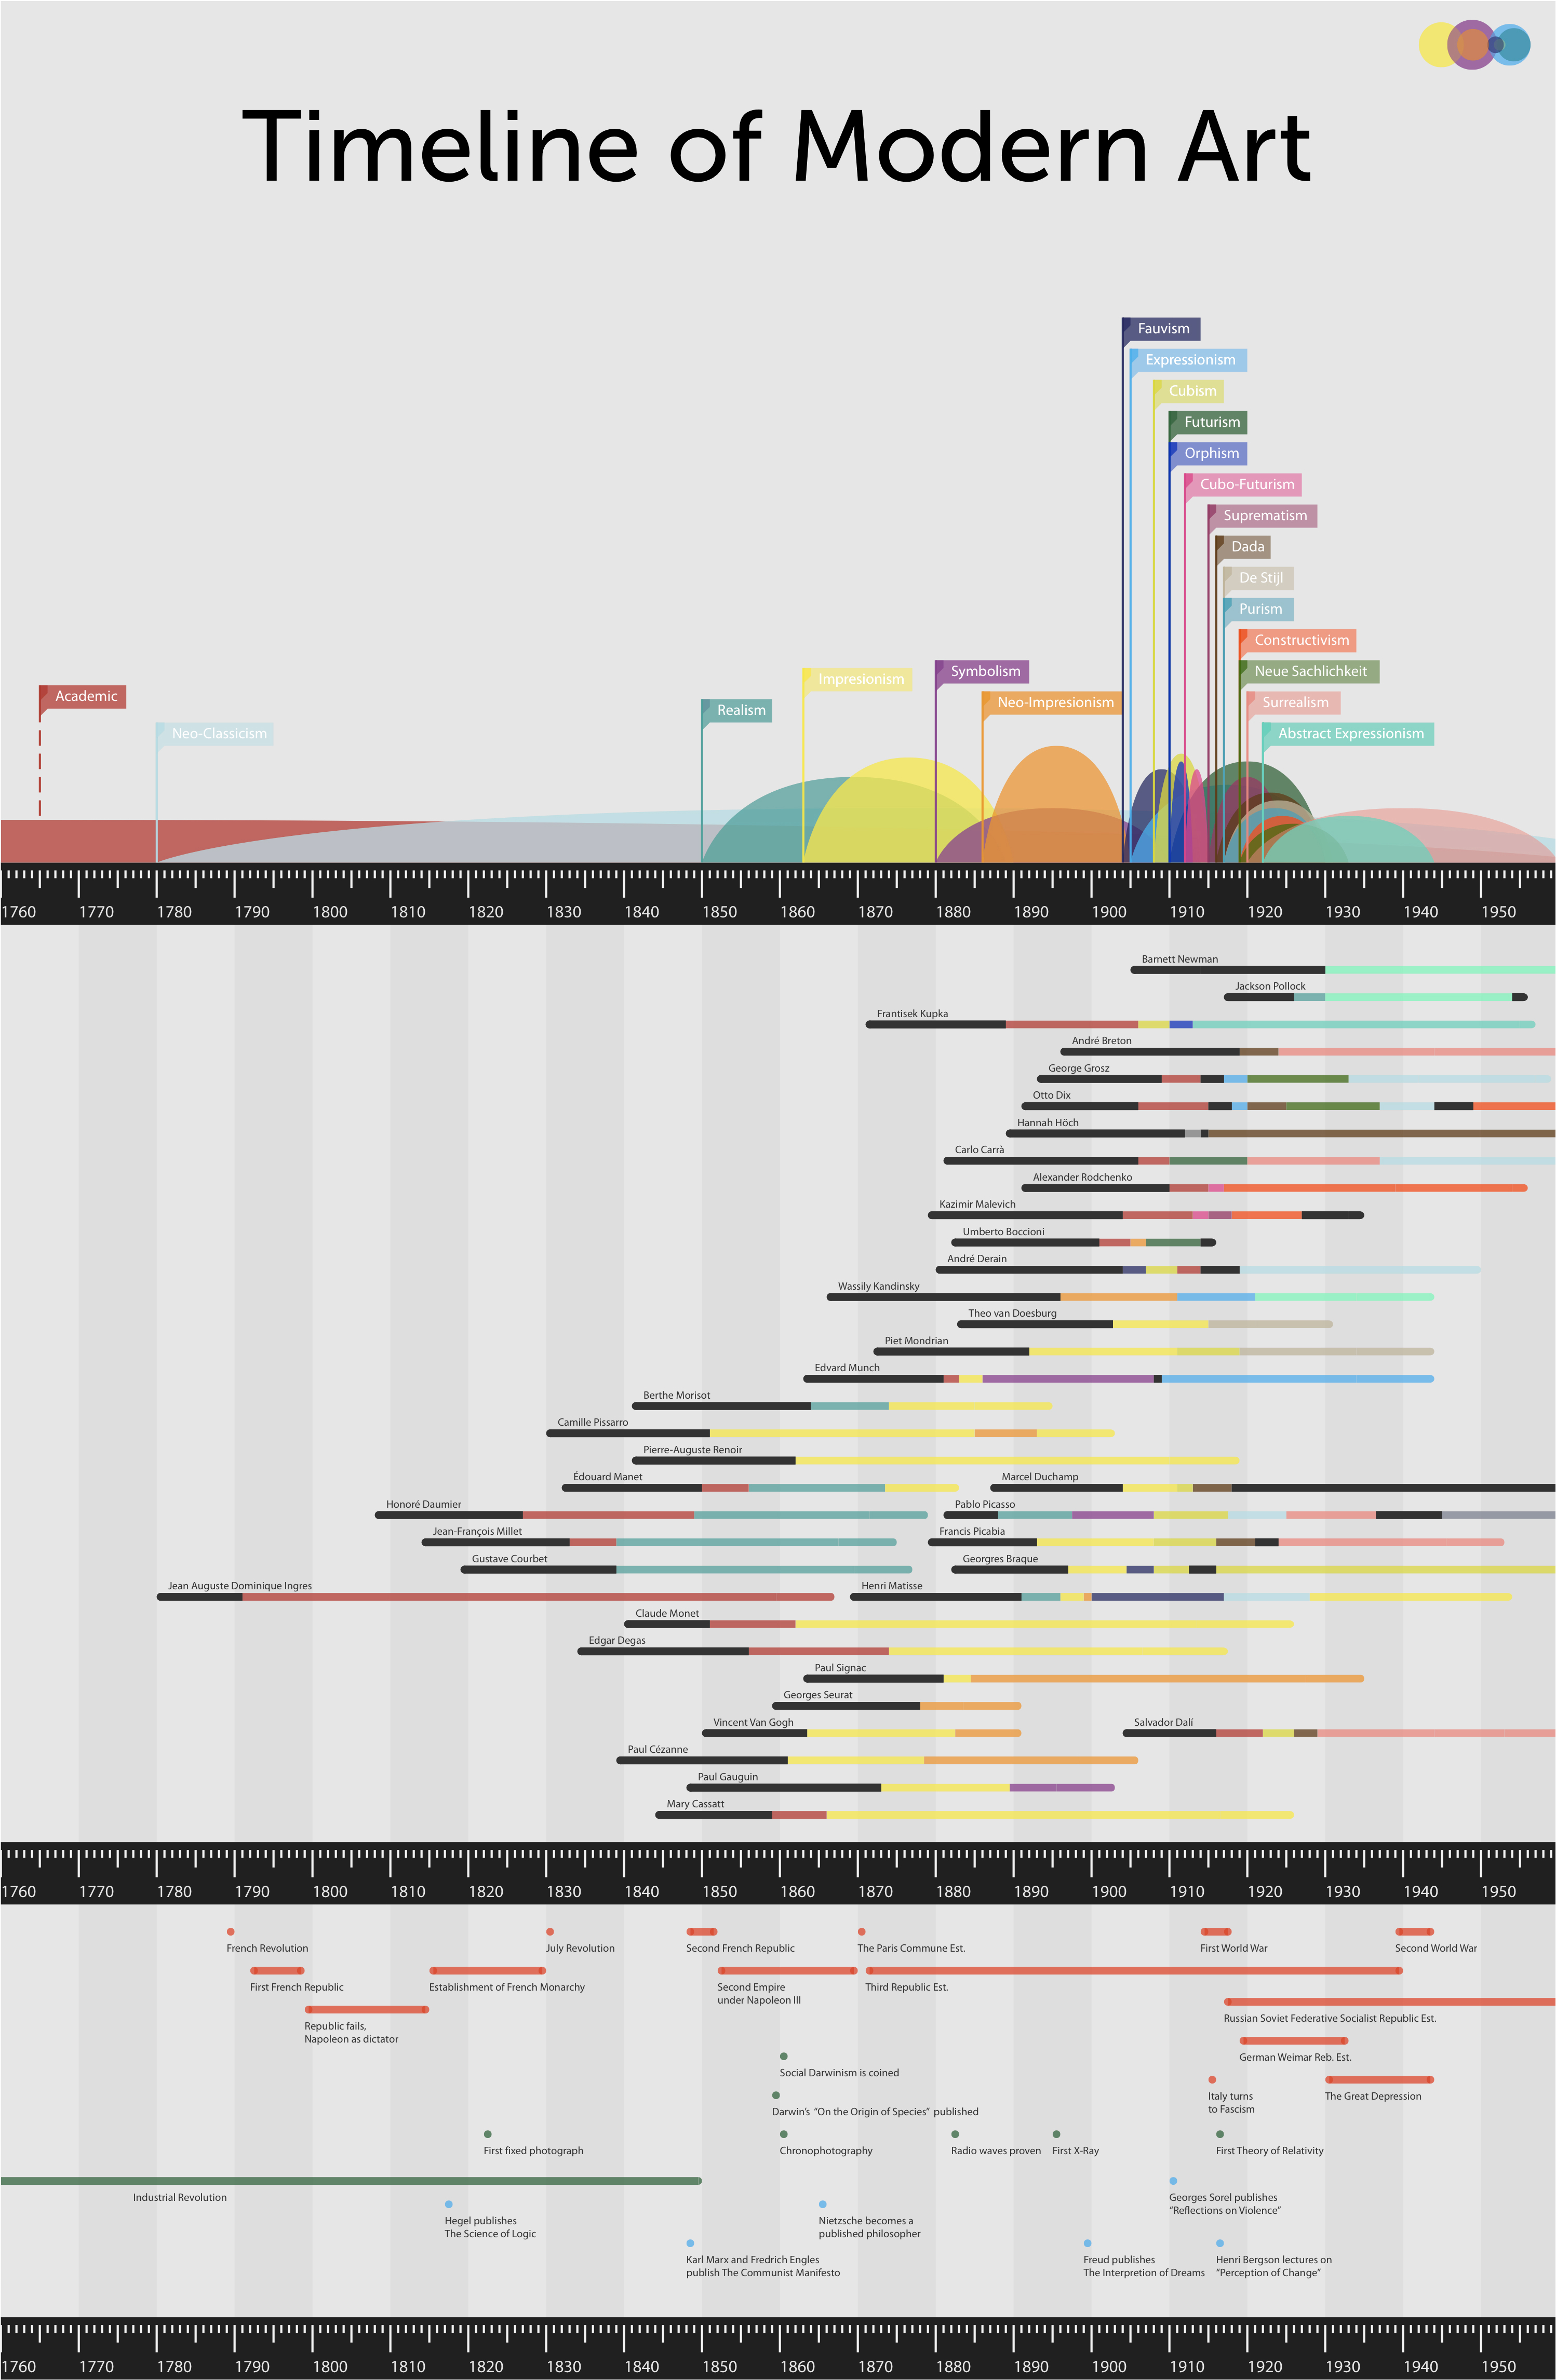 Ryan Parks // Graphic Design - Timeline of Modern Art